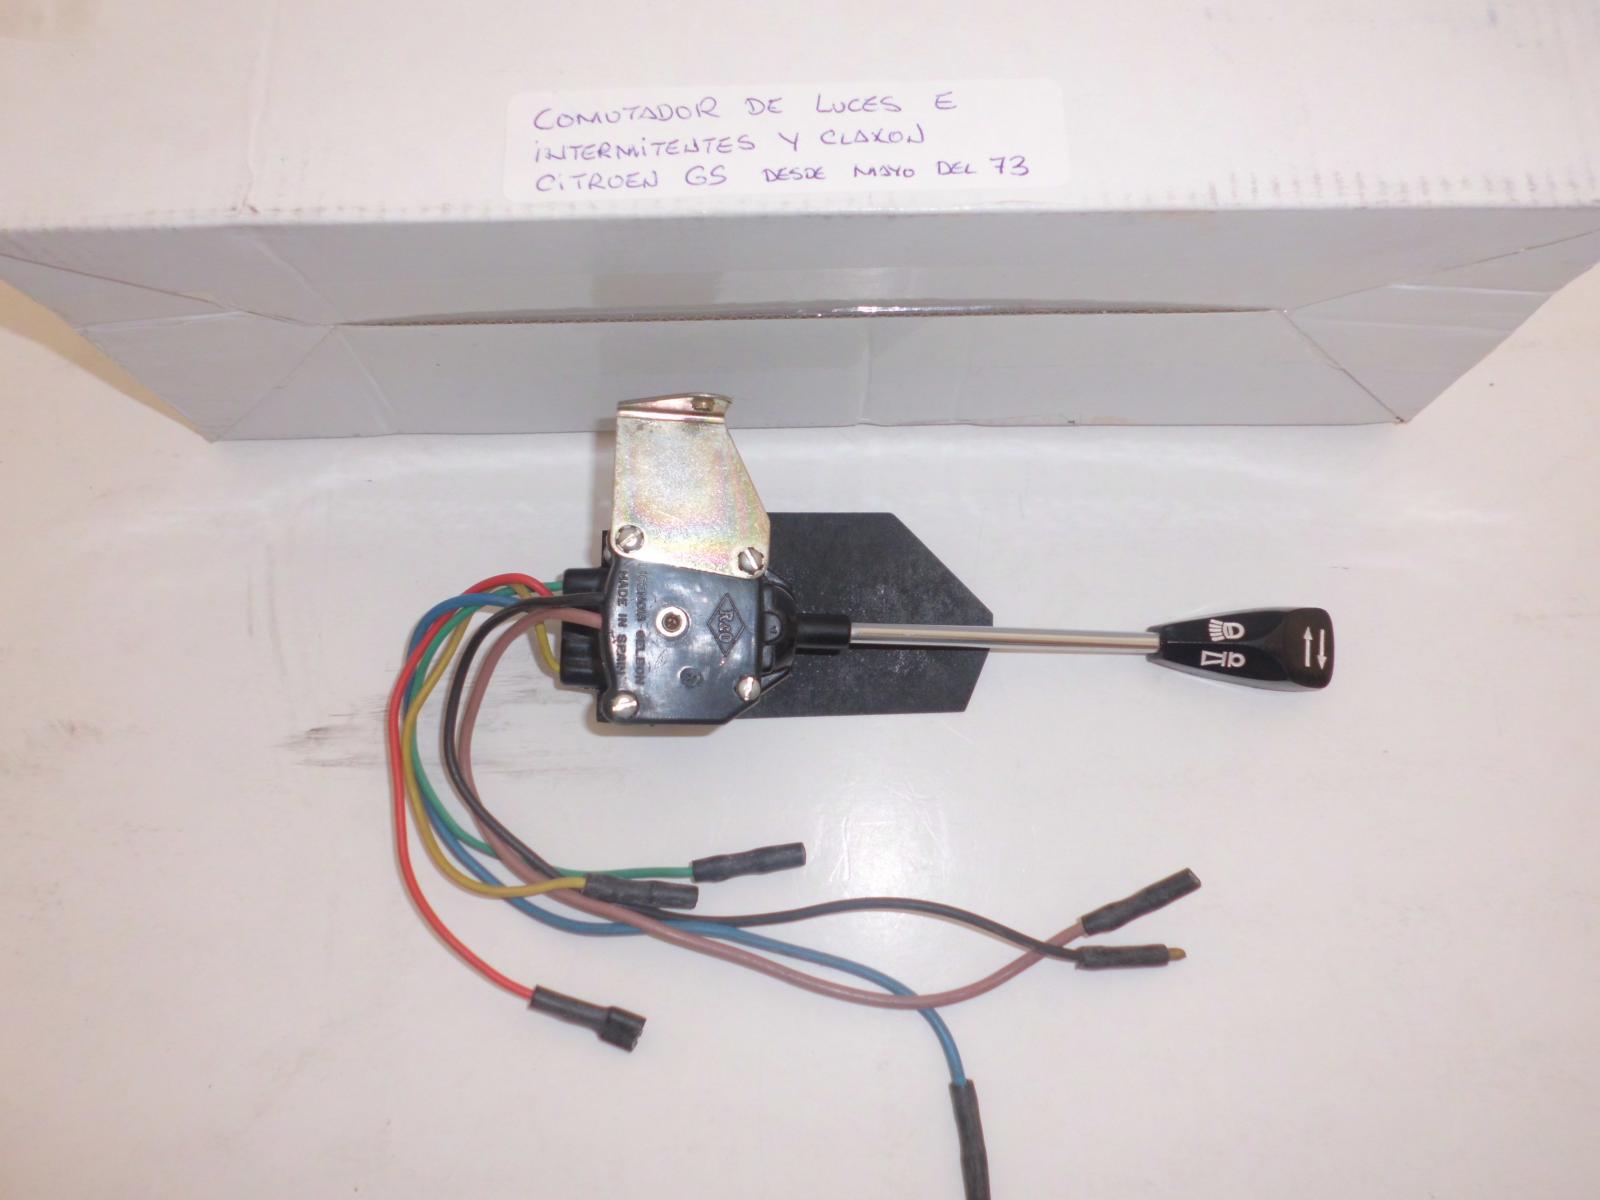 Conmutador de luces de Citroen GS